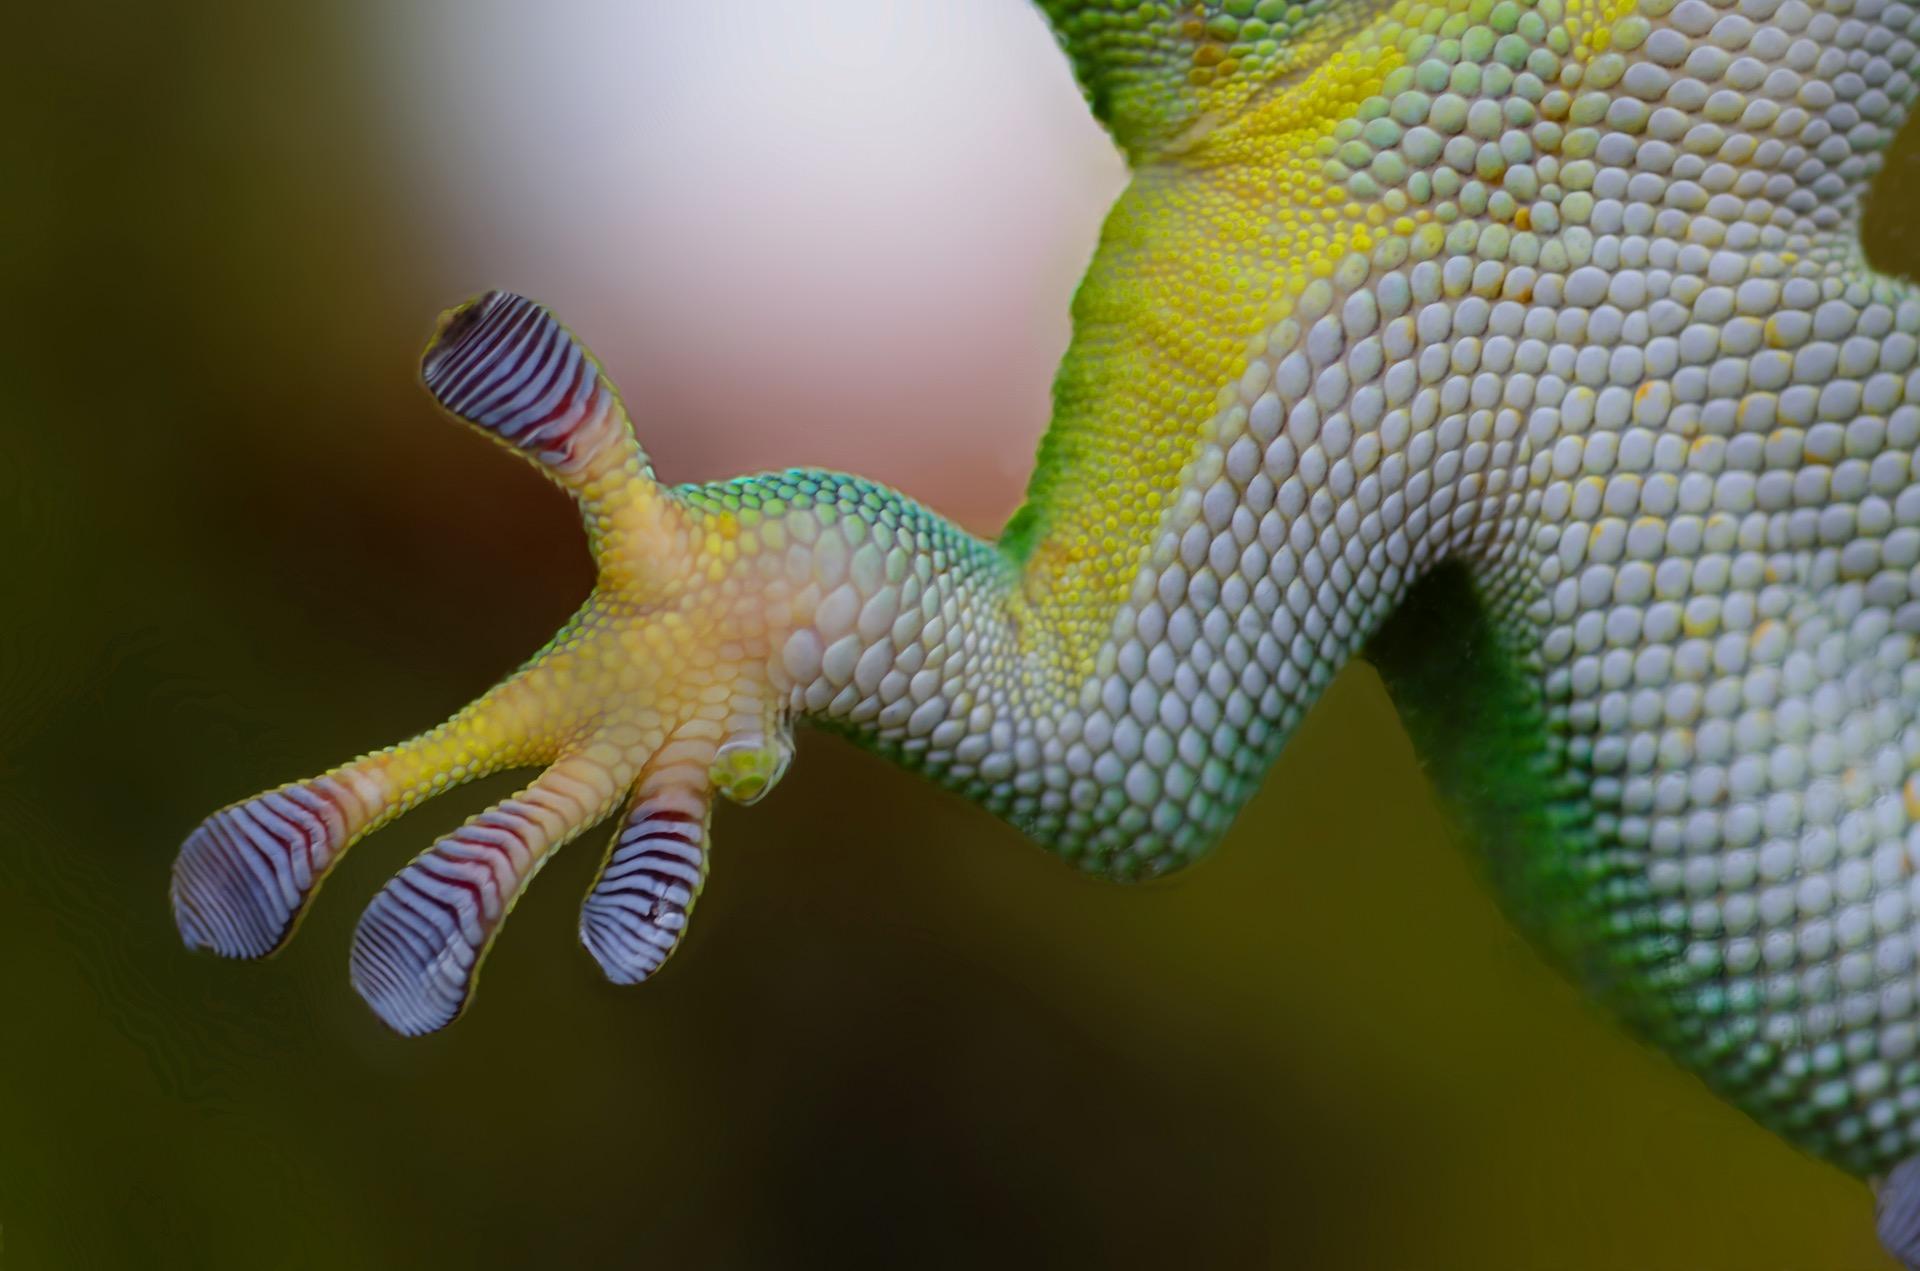 nature-hand-animal-frog-greenery